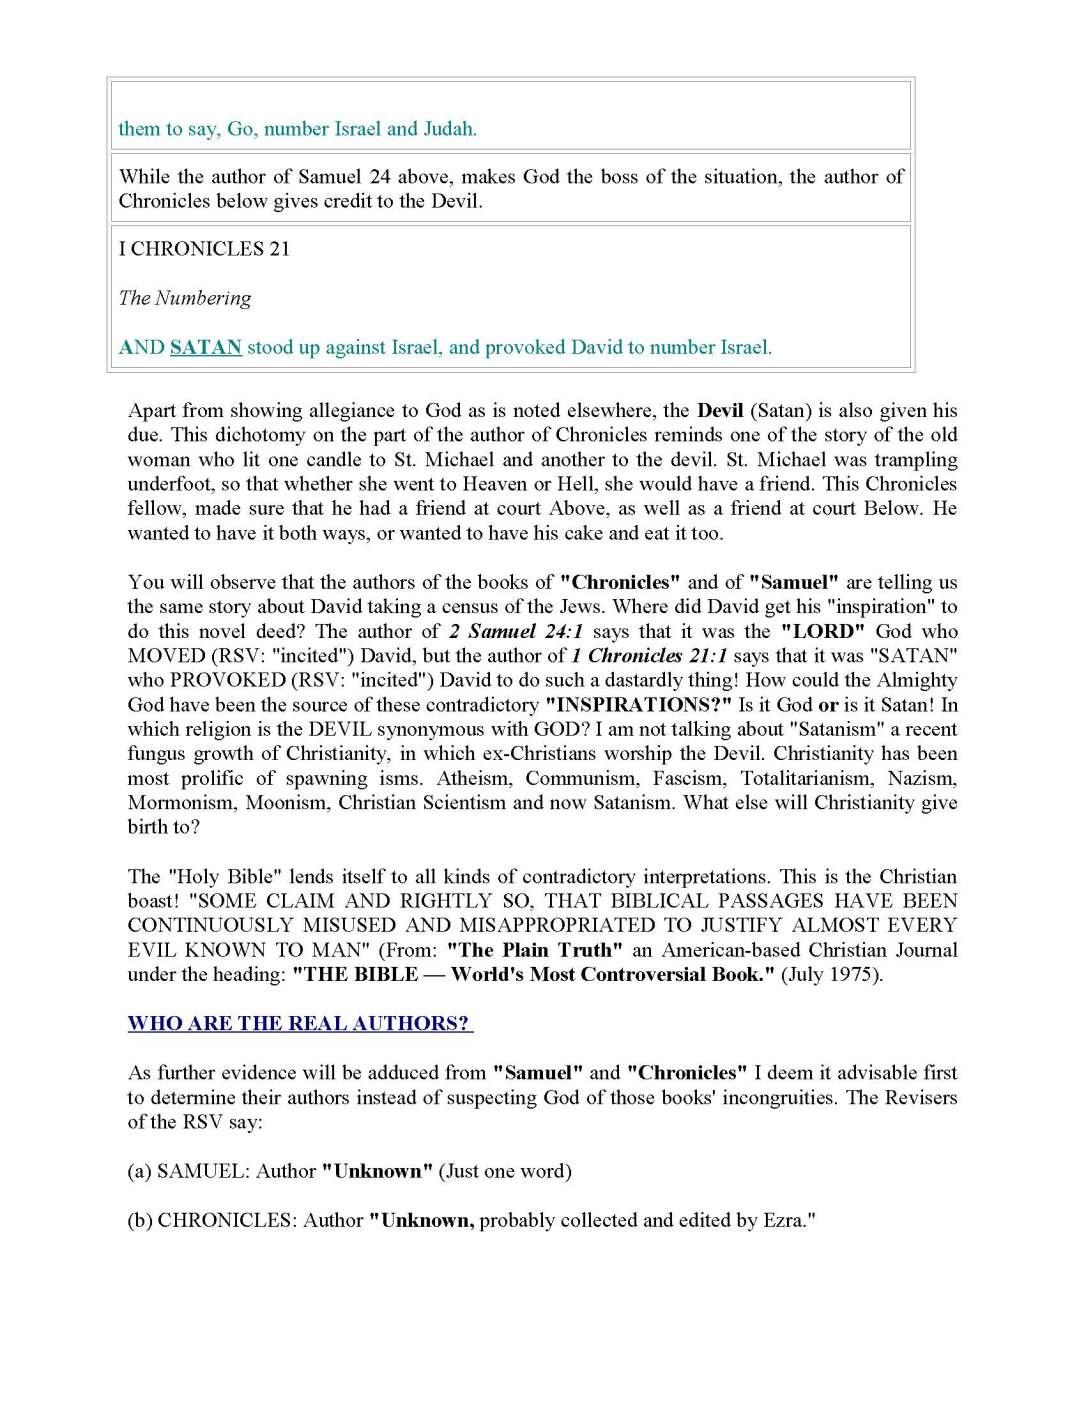 Is The Bible Gods Word [deedat]_Page_27